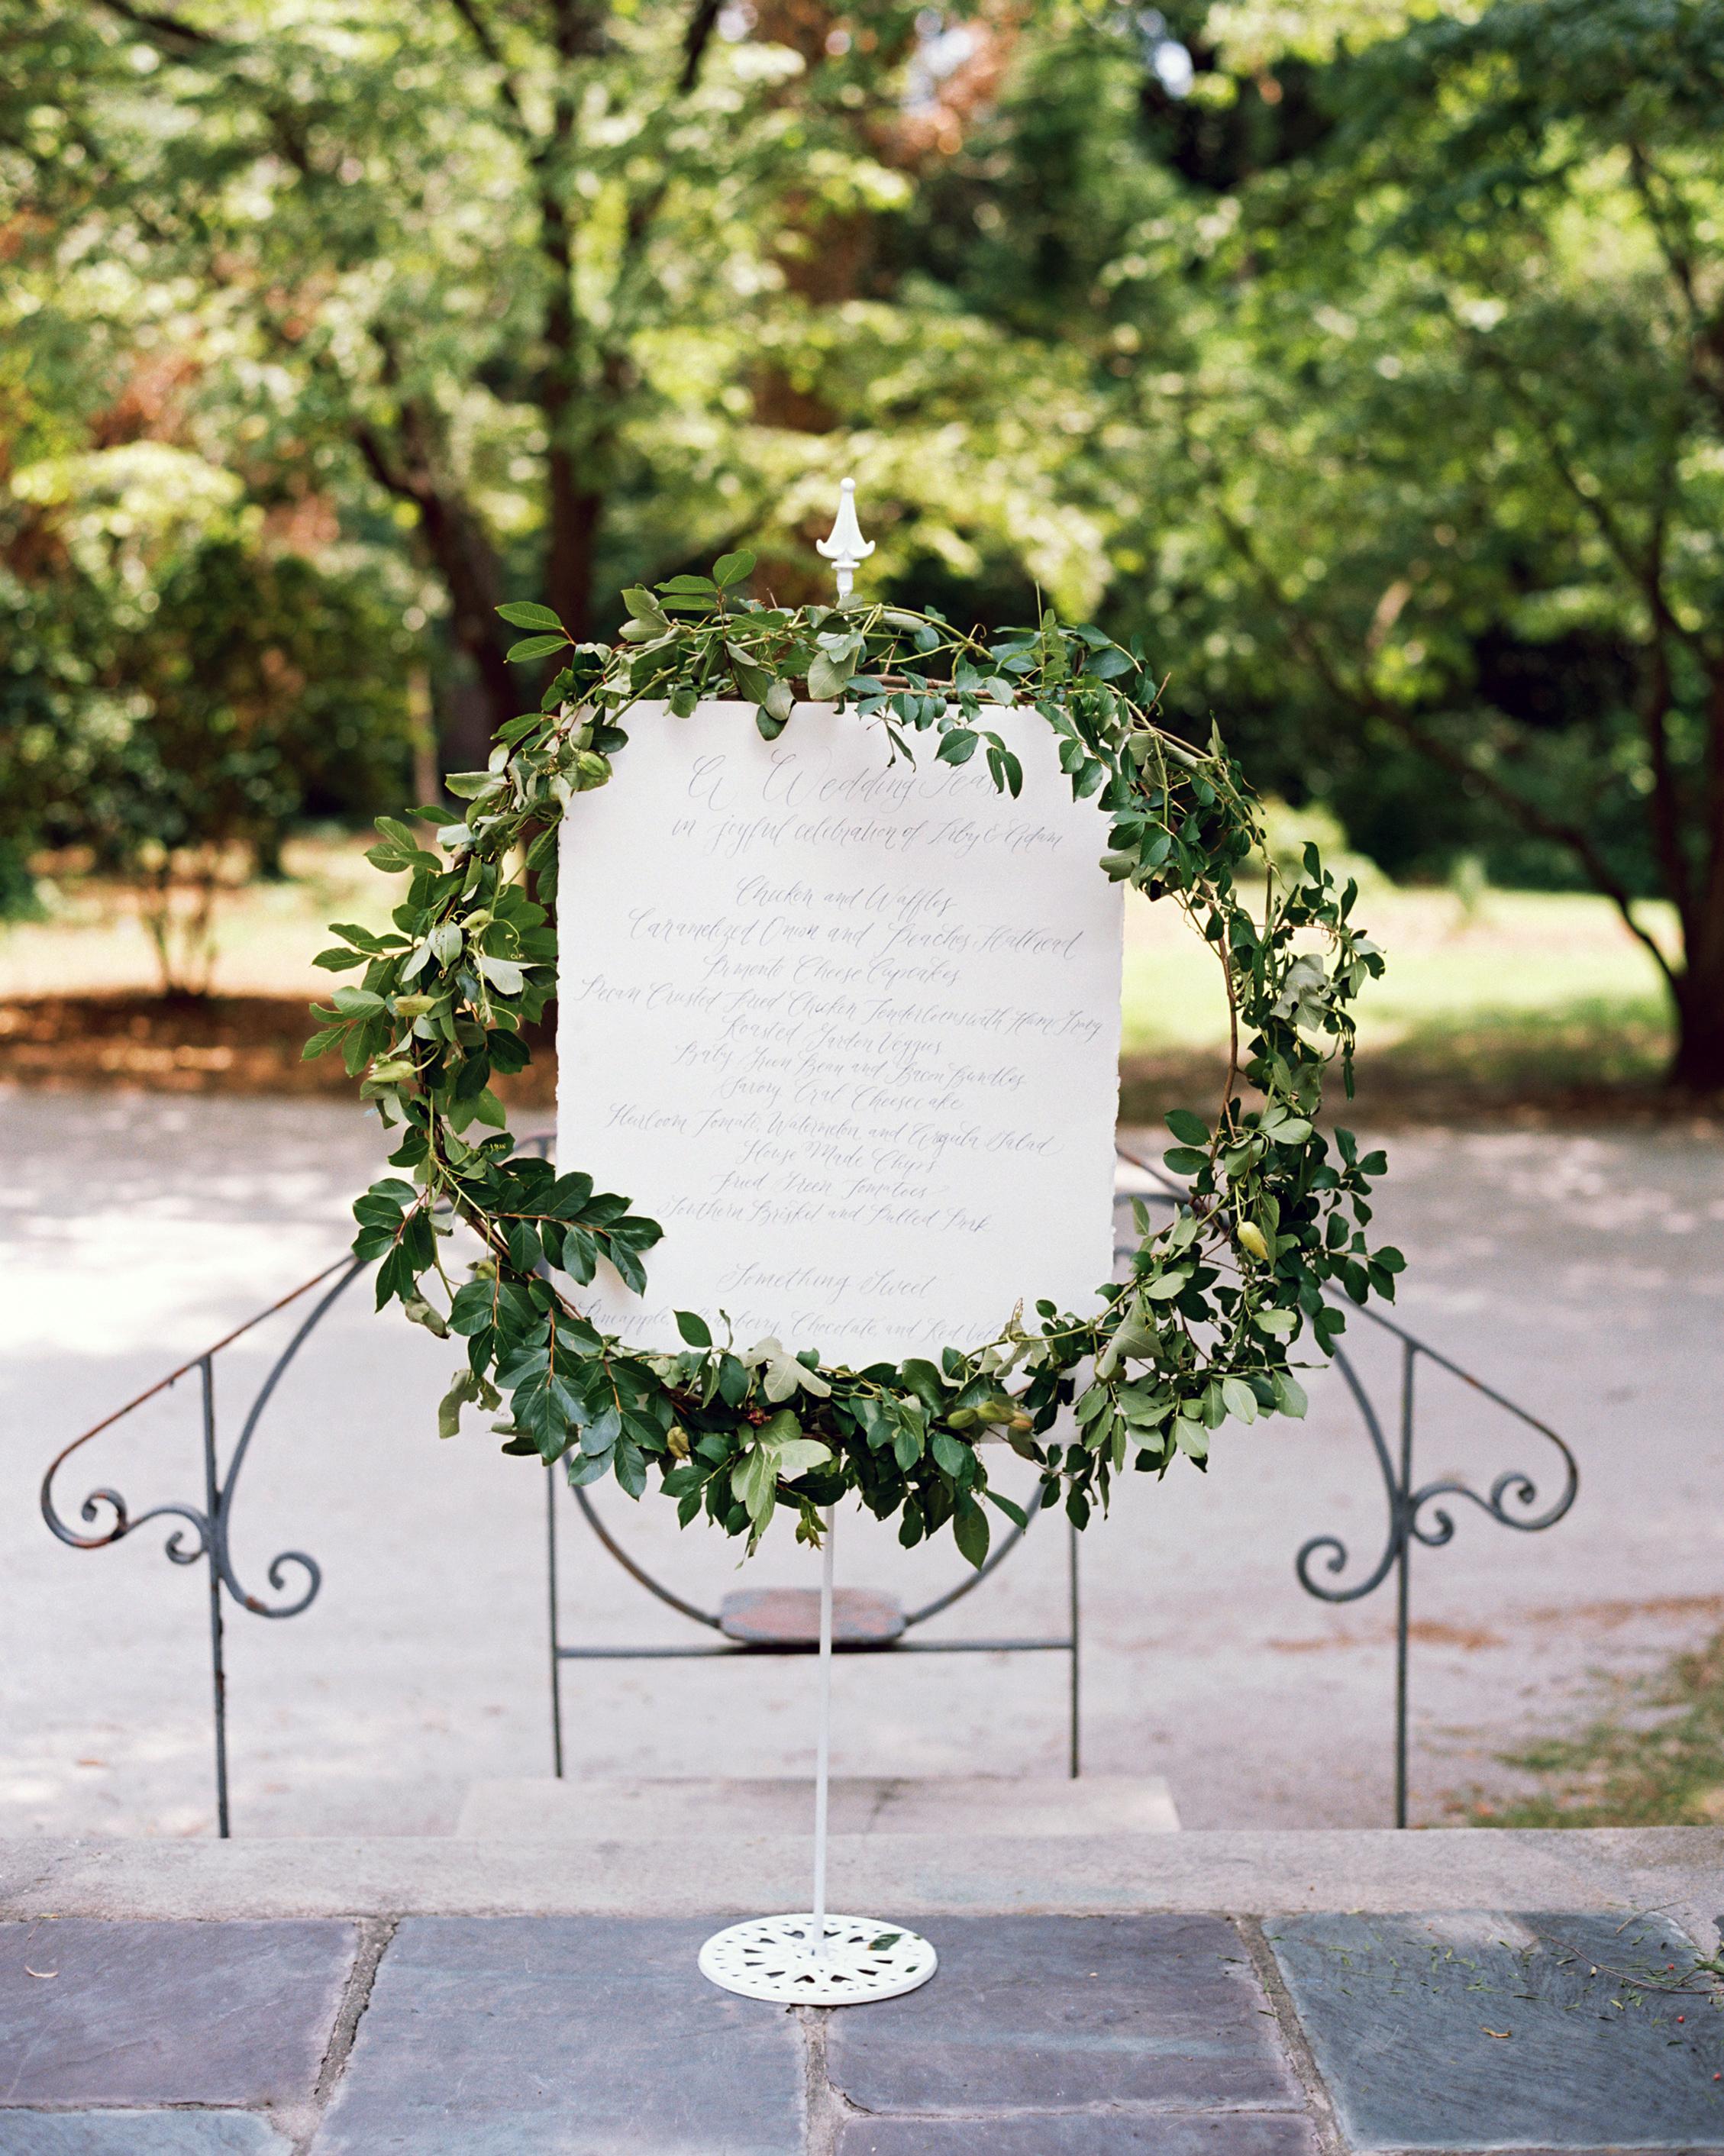 irby-adam-wedding-menu-13-s111660-1014.jpg